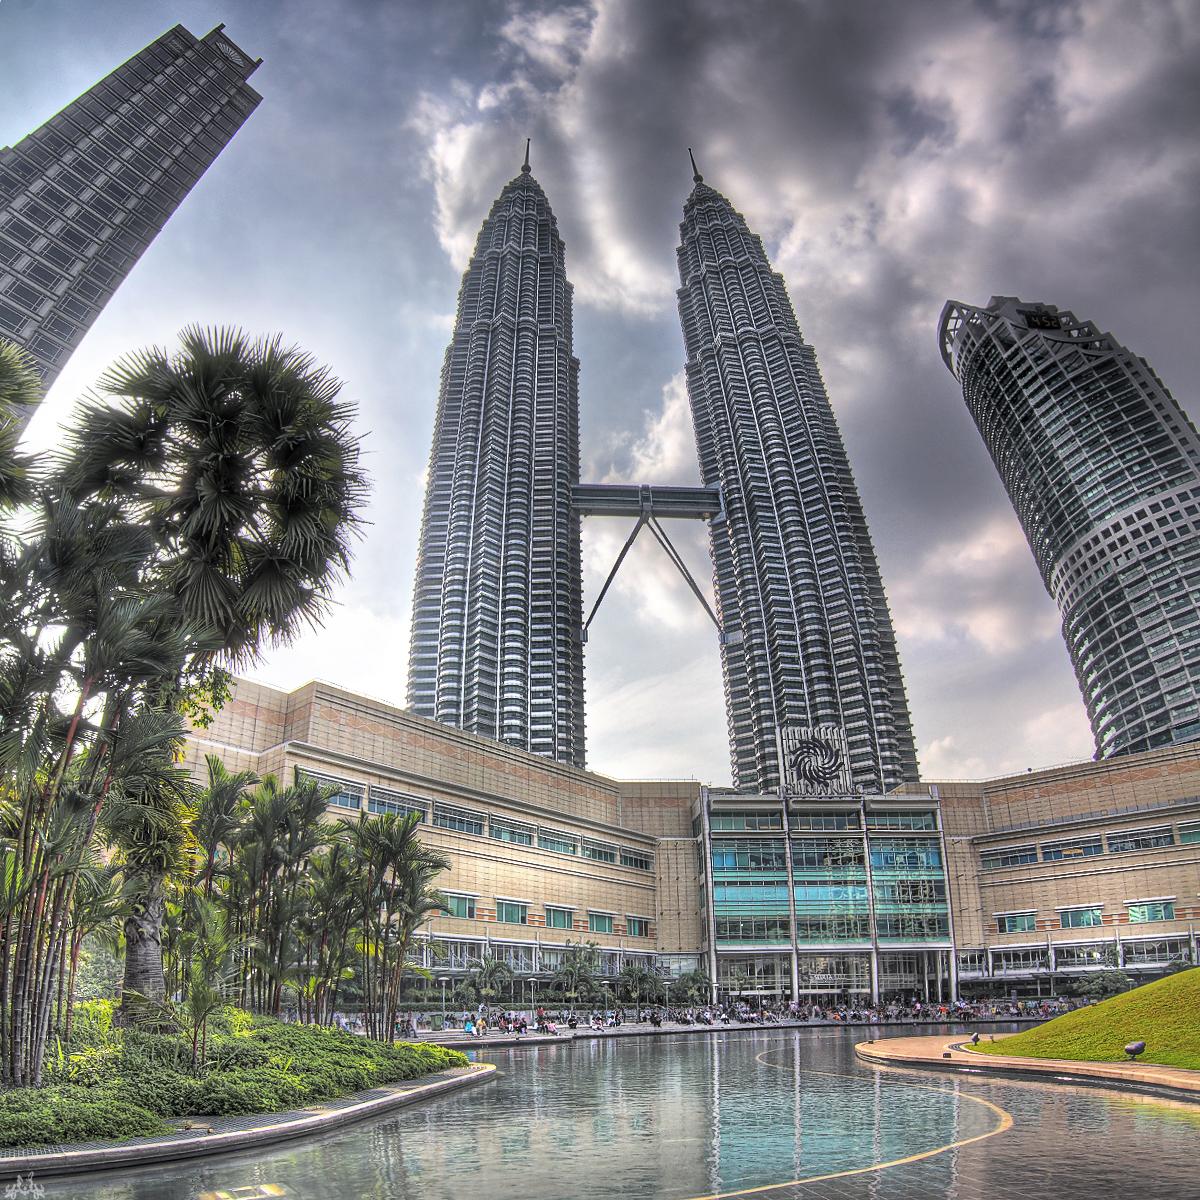 Malaysia: BEST STRUCTURES : Petronas Towers Kuala Lumpur, Malaysia